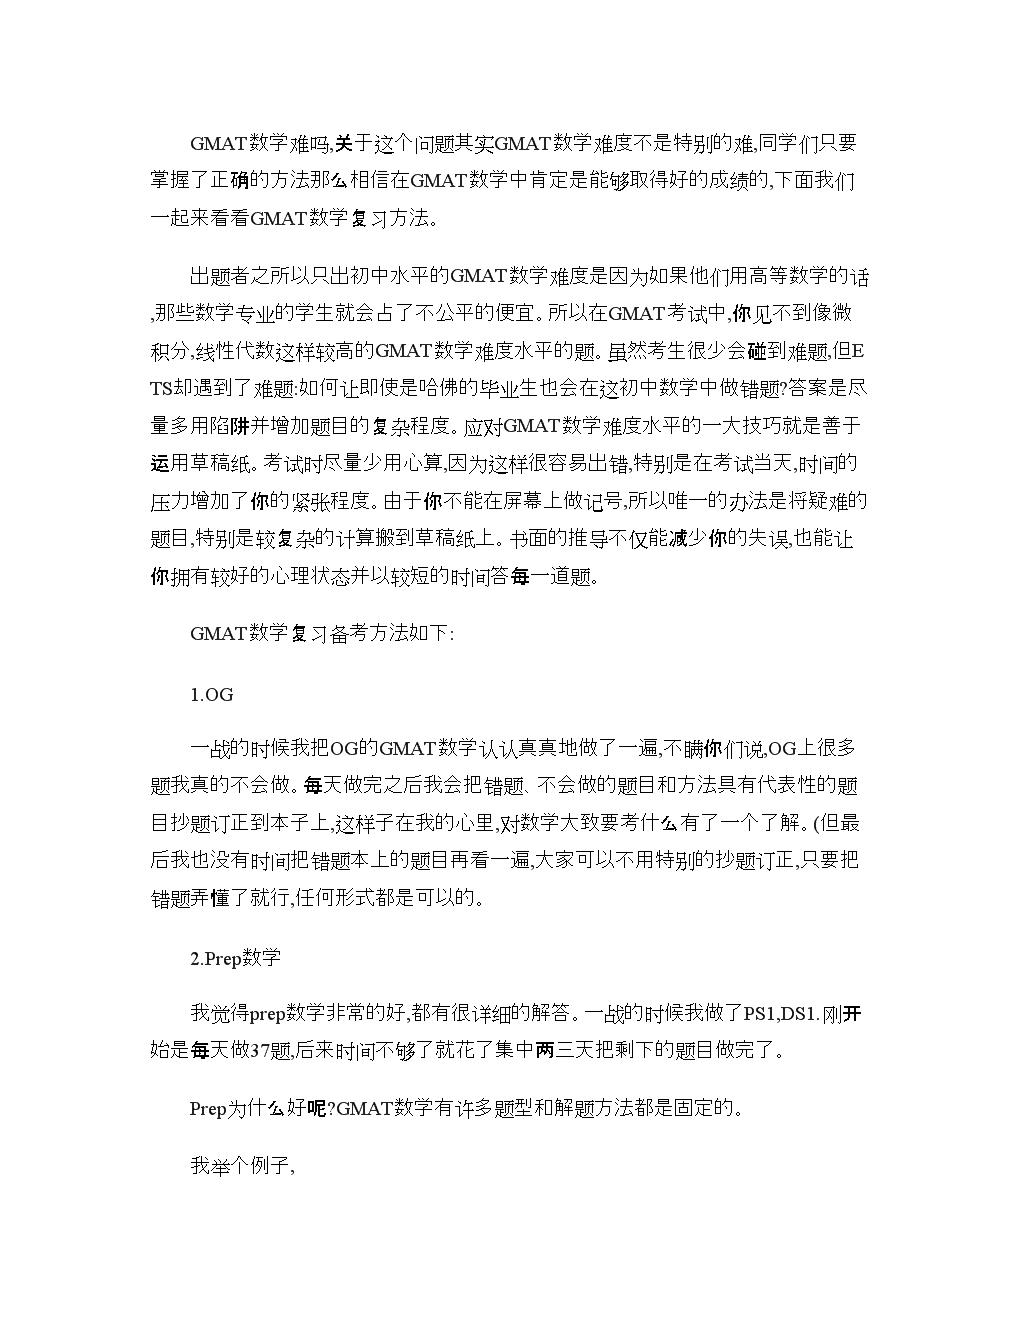 GMAT数学备考指南.doc